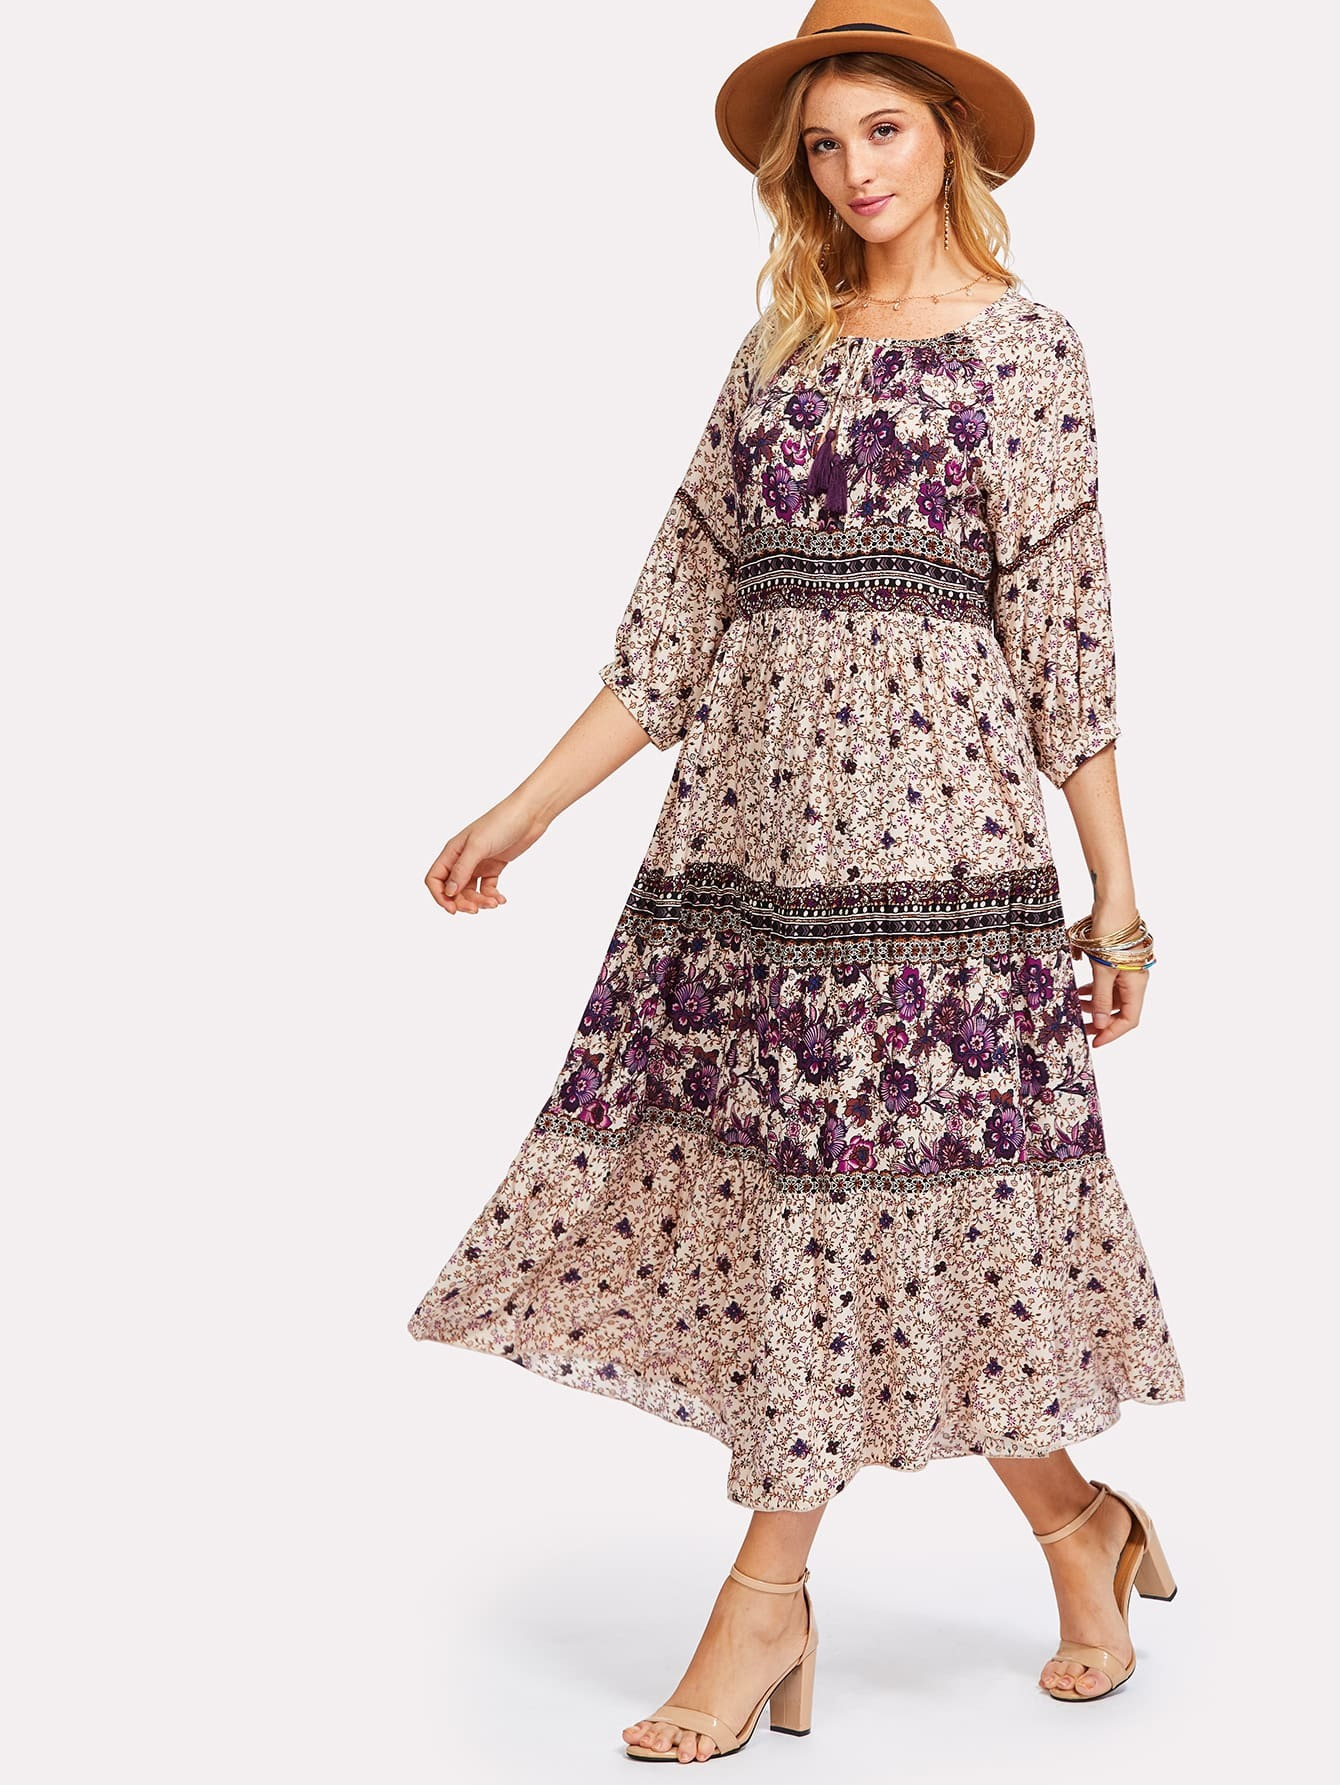 Tassel Tied Neck Flower Print Dress tied neck geo print flare dress